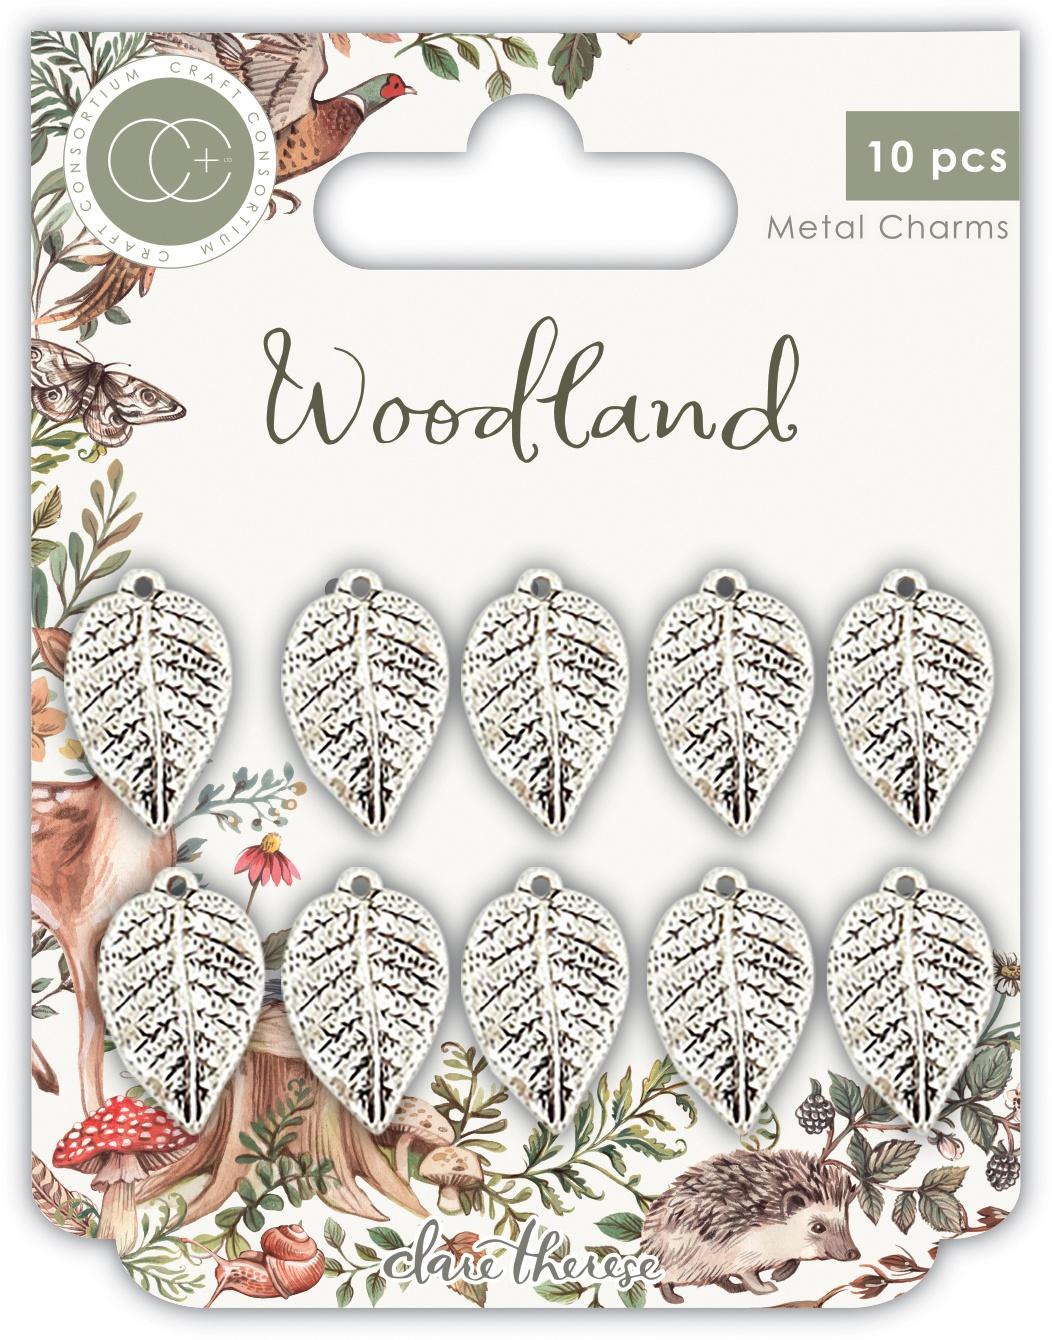 Craft Consortium Woodland Metal Charms 10/Pkg-Silver Leaf